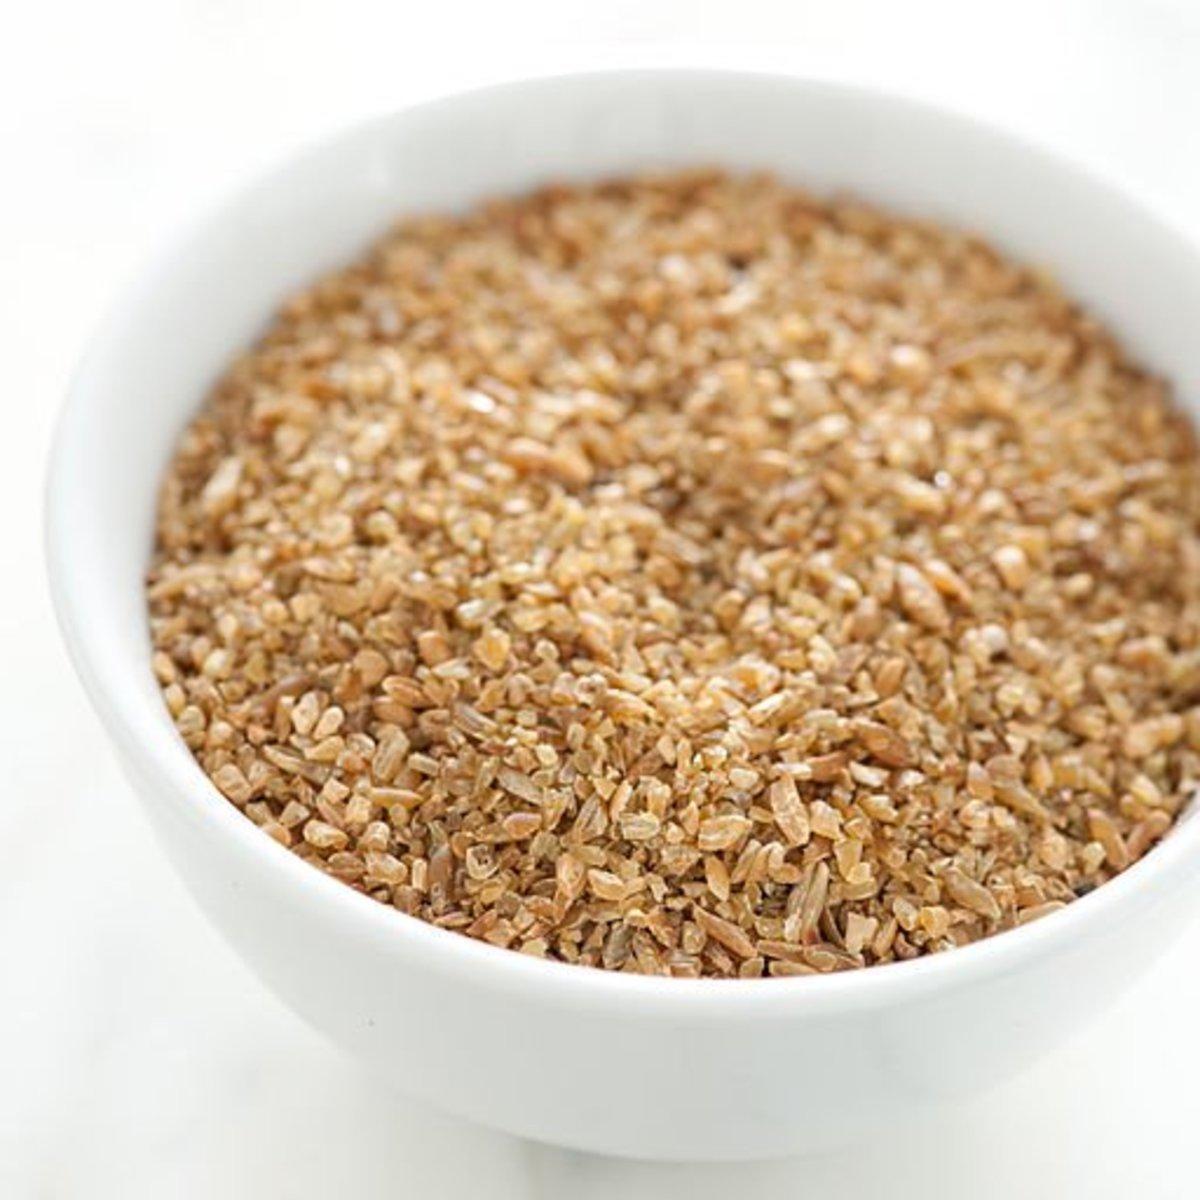 Uncooked Freekah grains